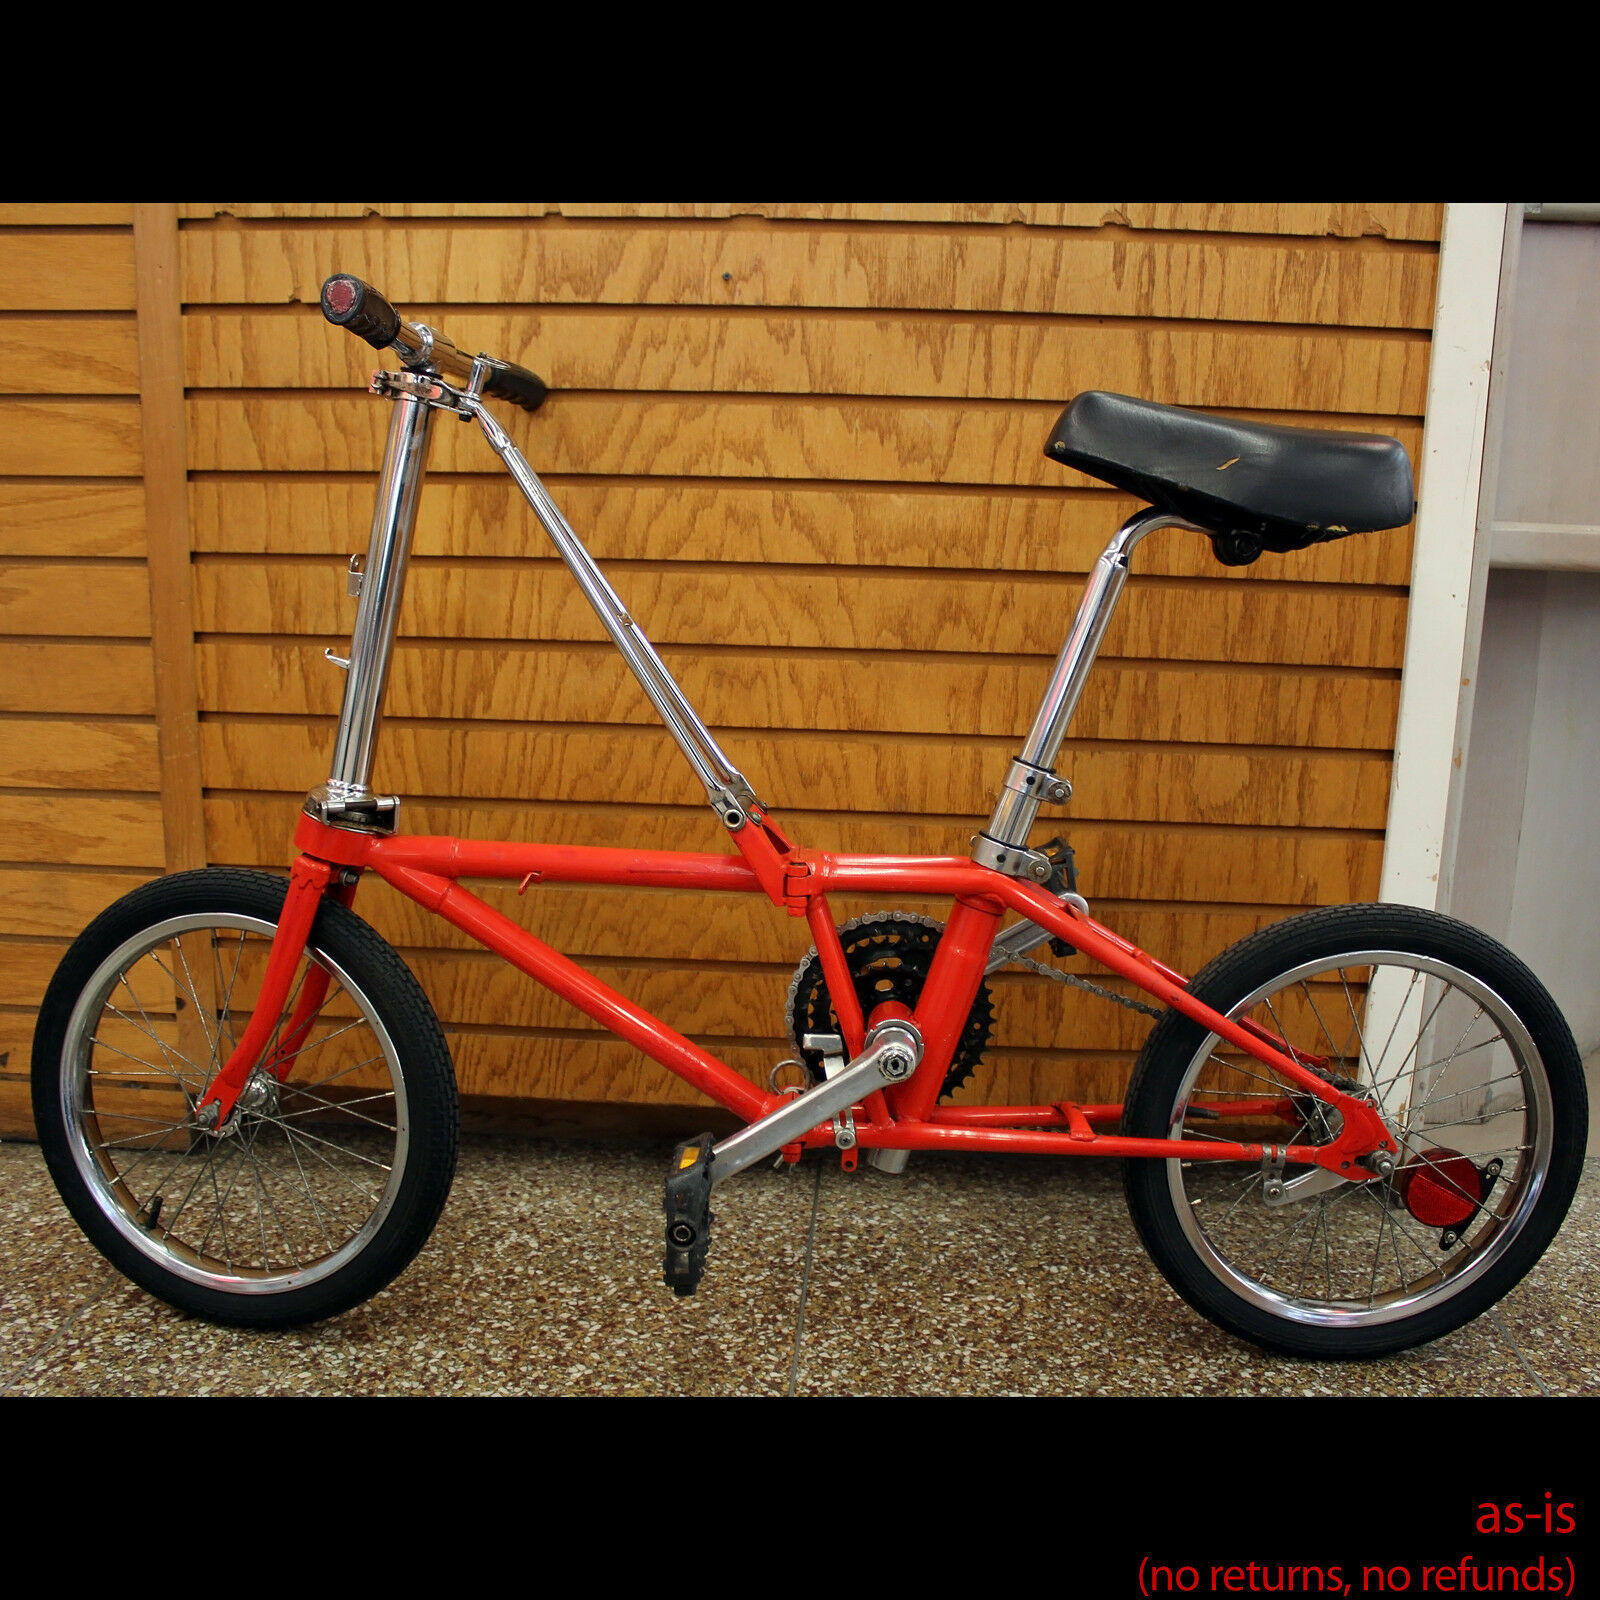 Vintage Dahon Folding Bike Bicycle, 3 Speed, For Parts or Repair